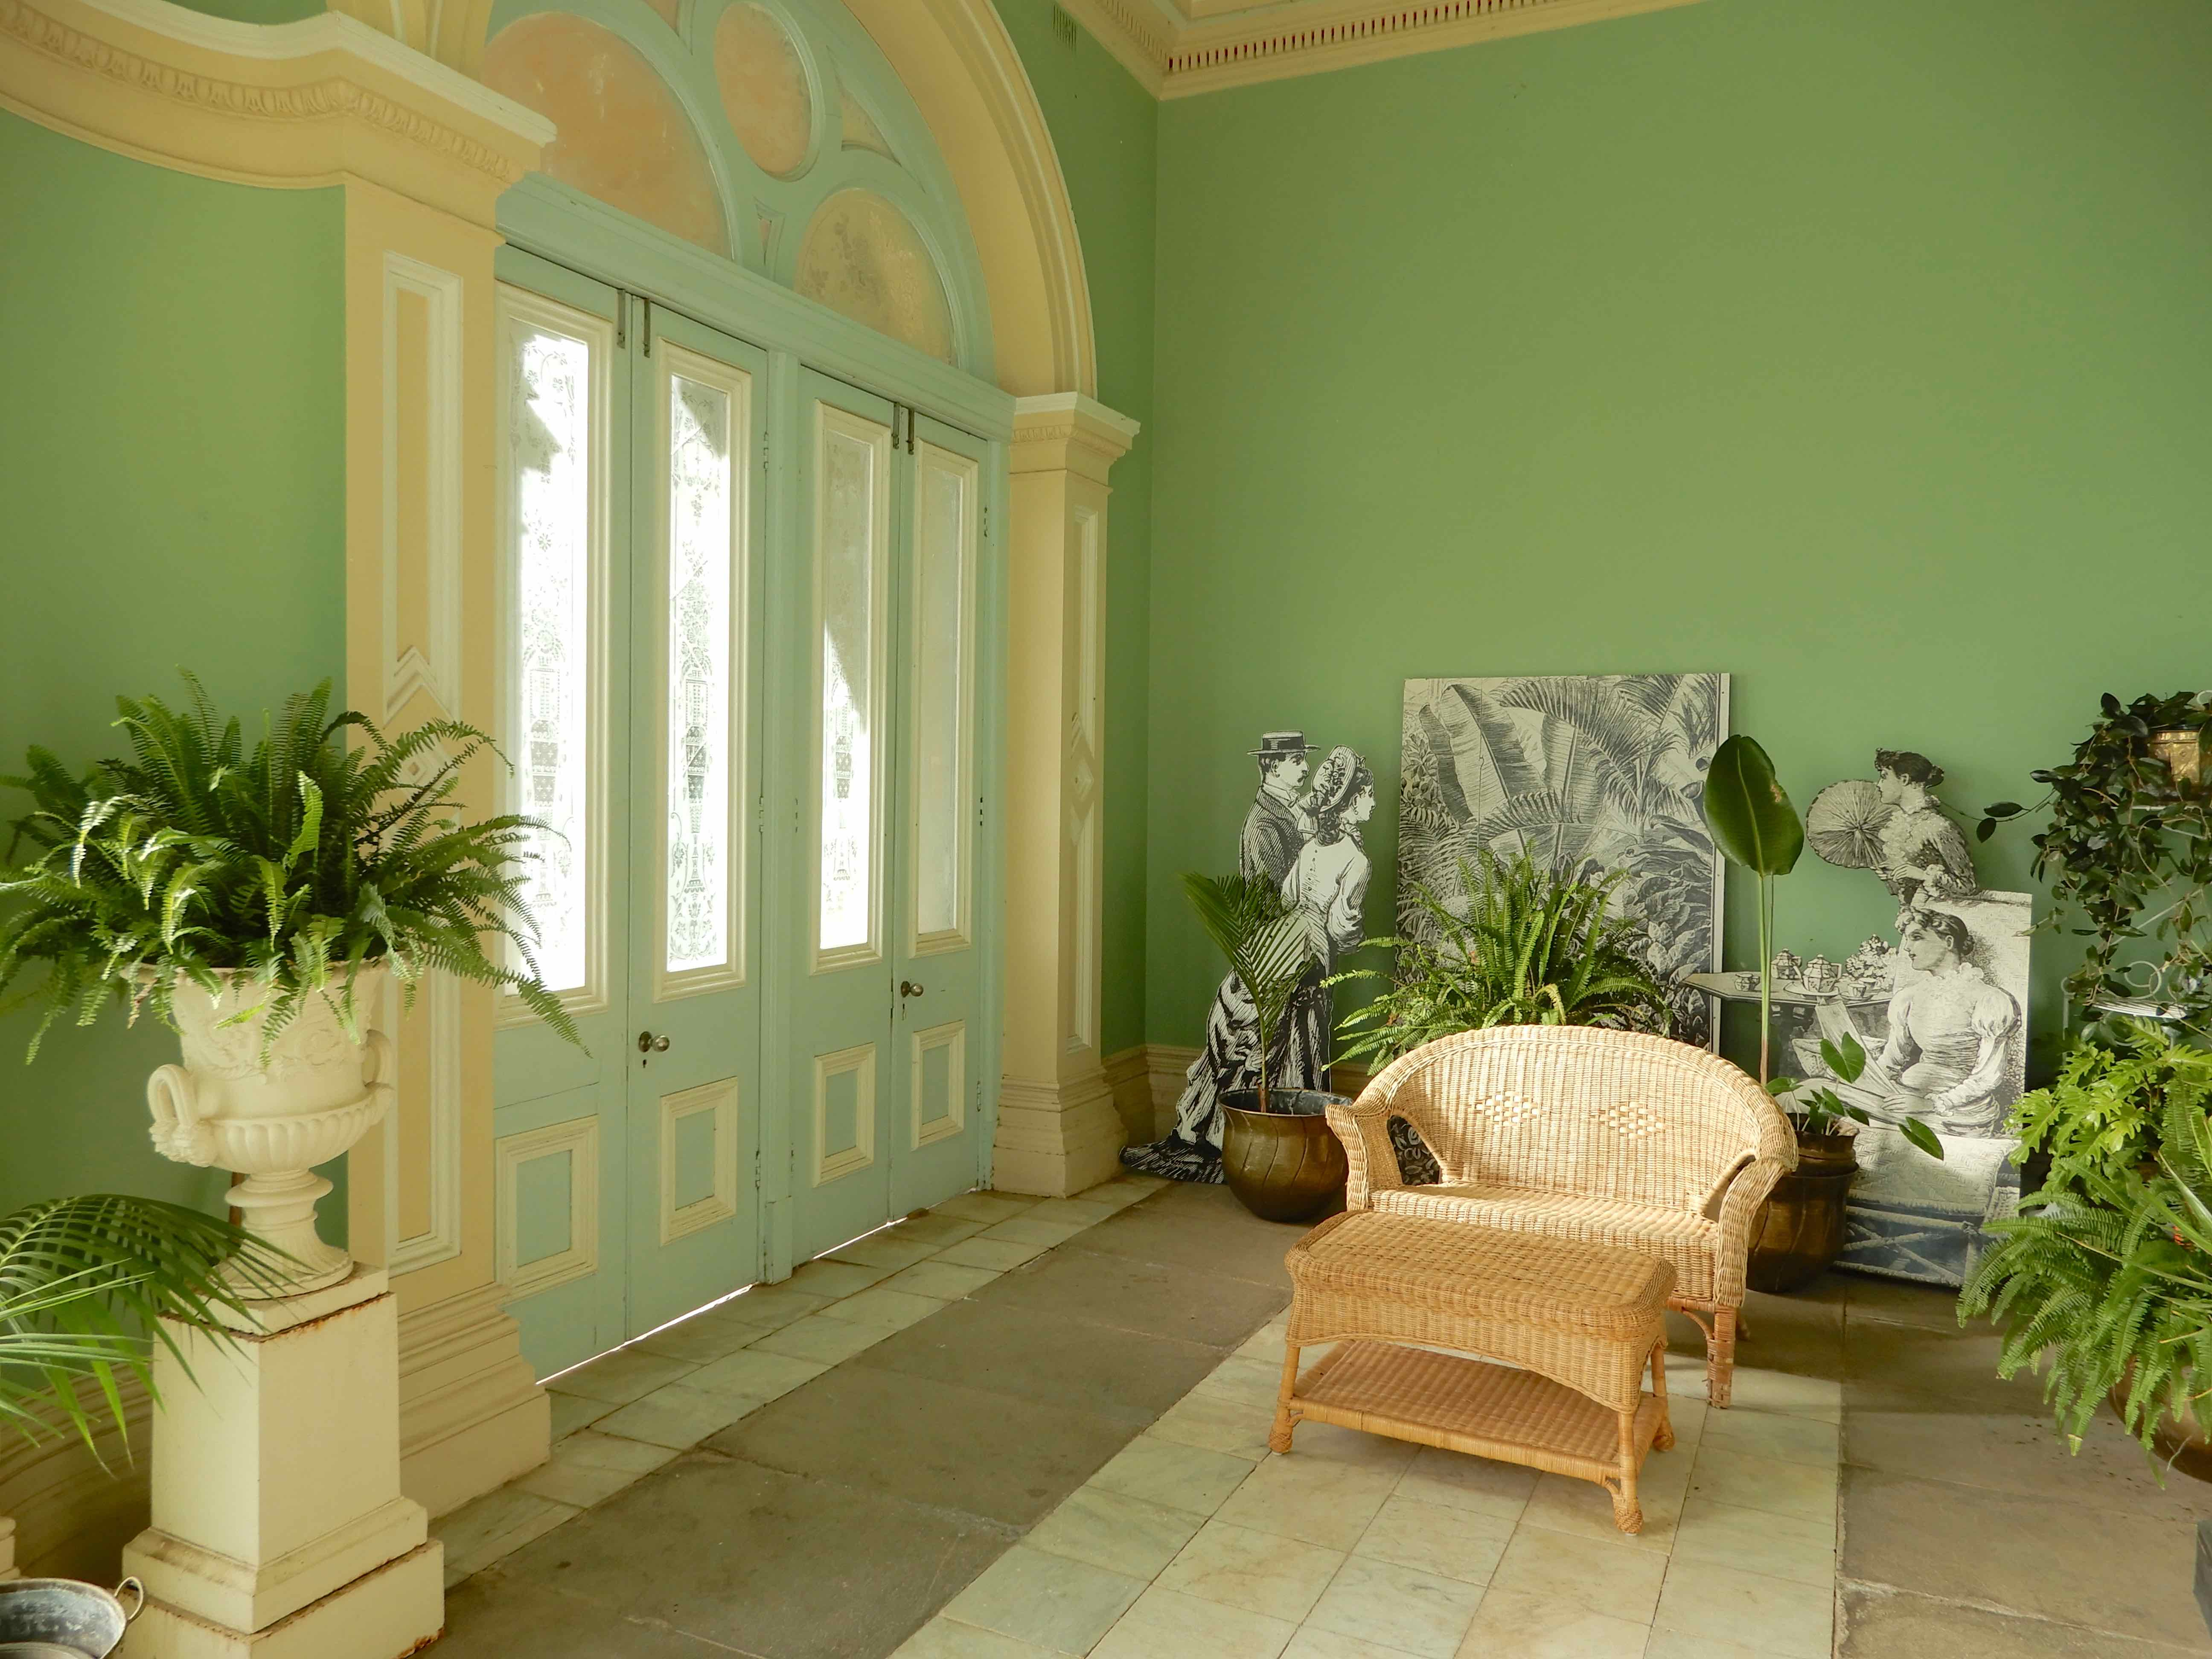 27.conservatory